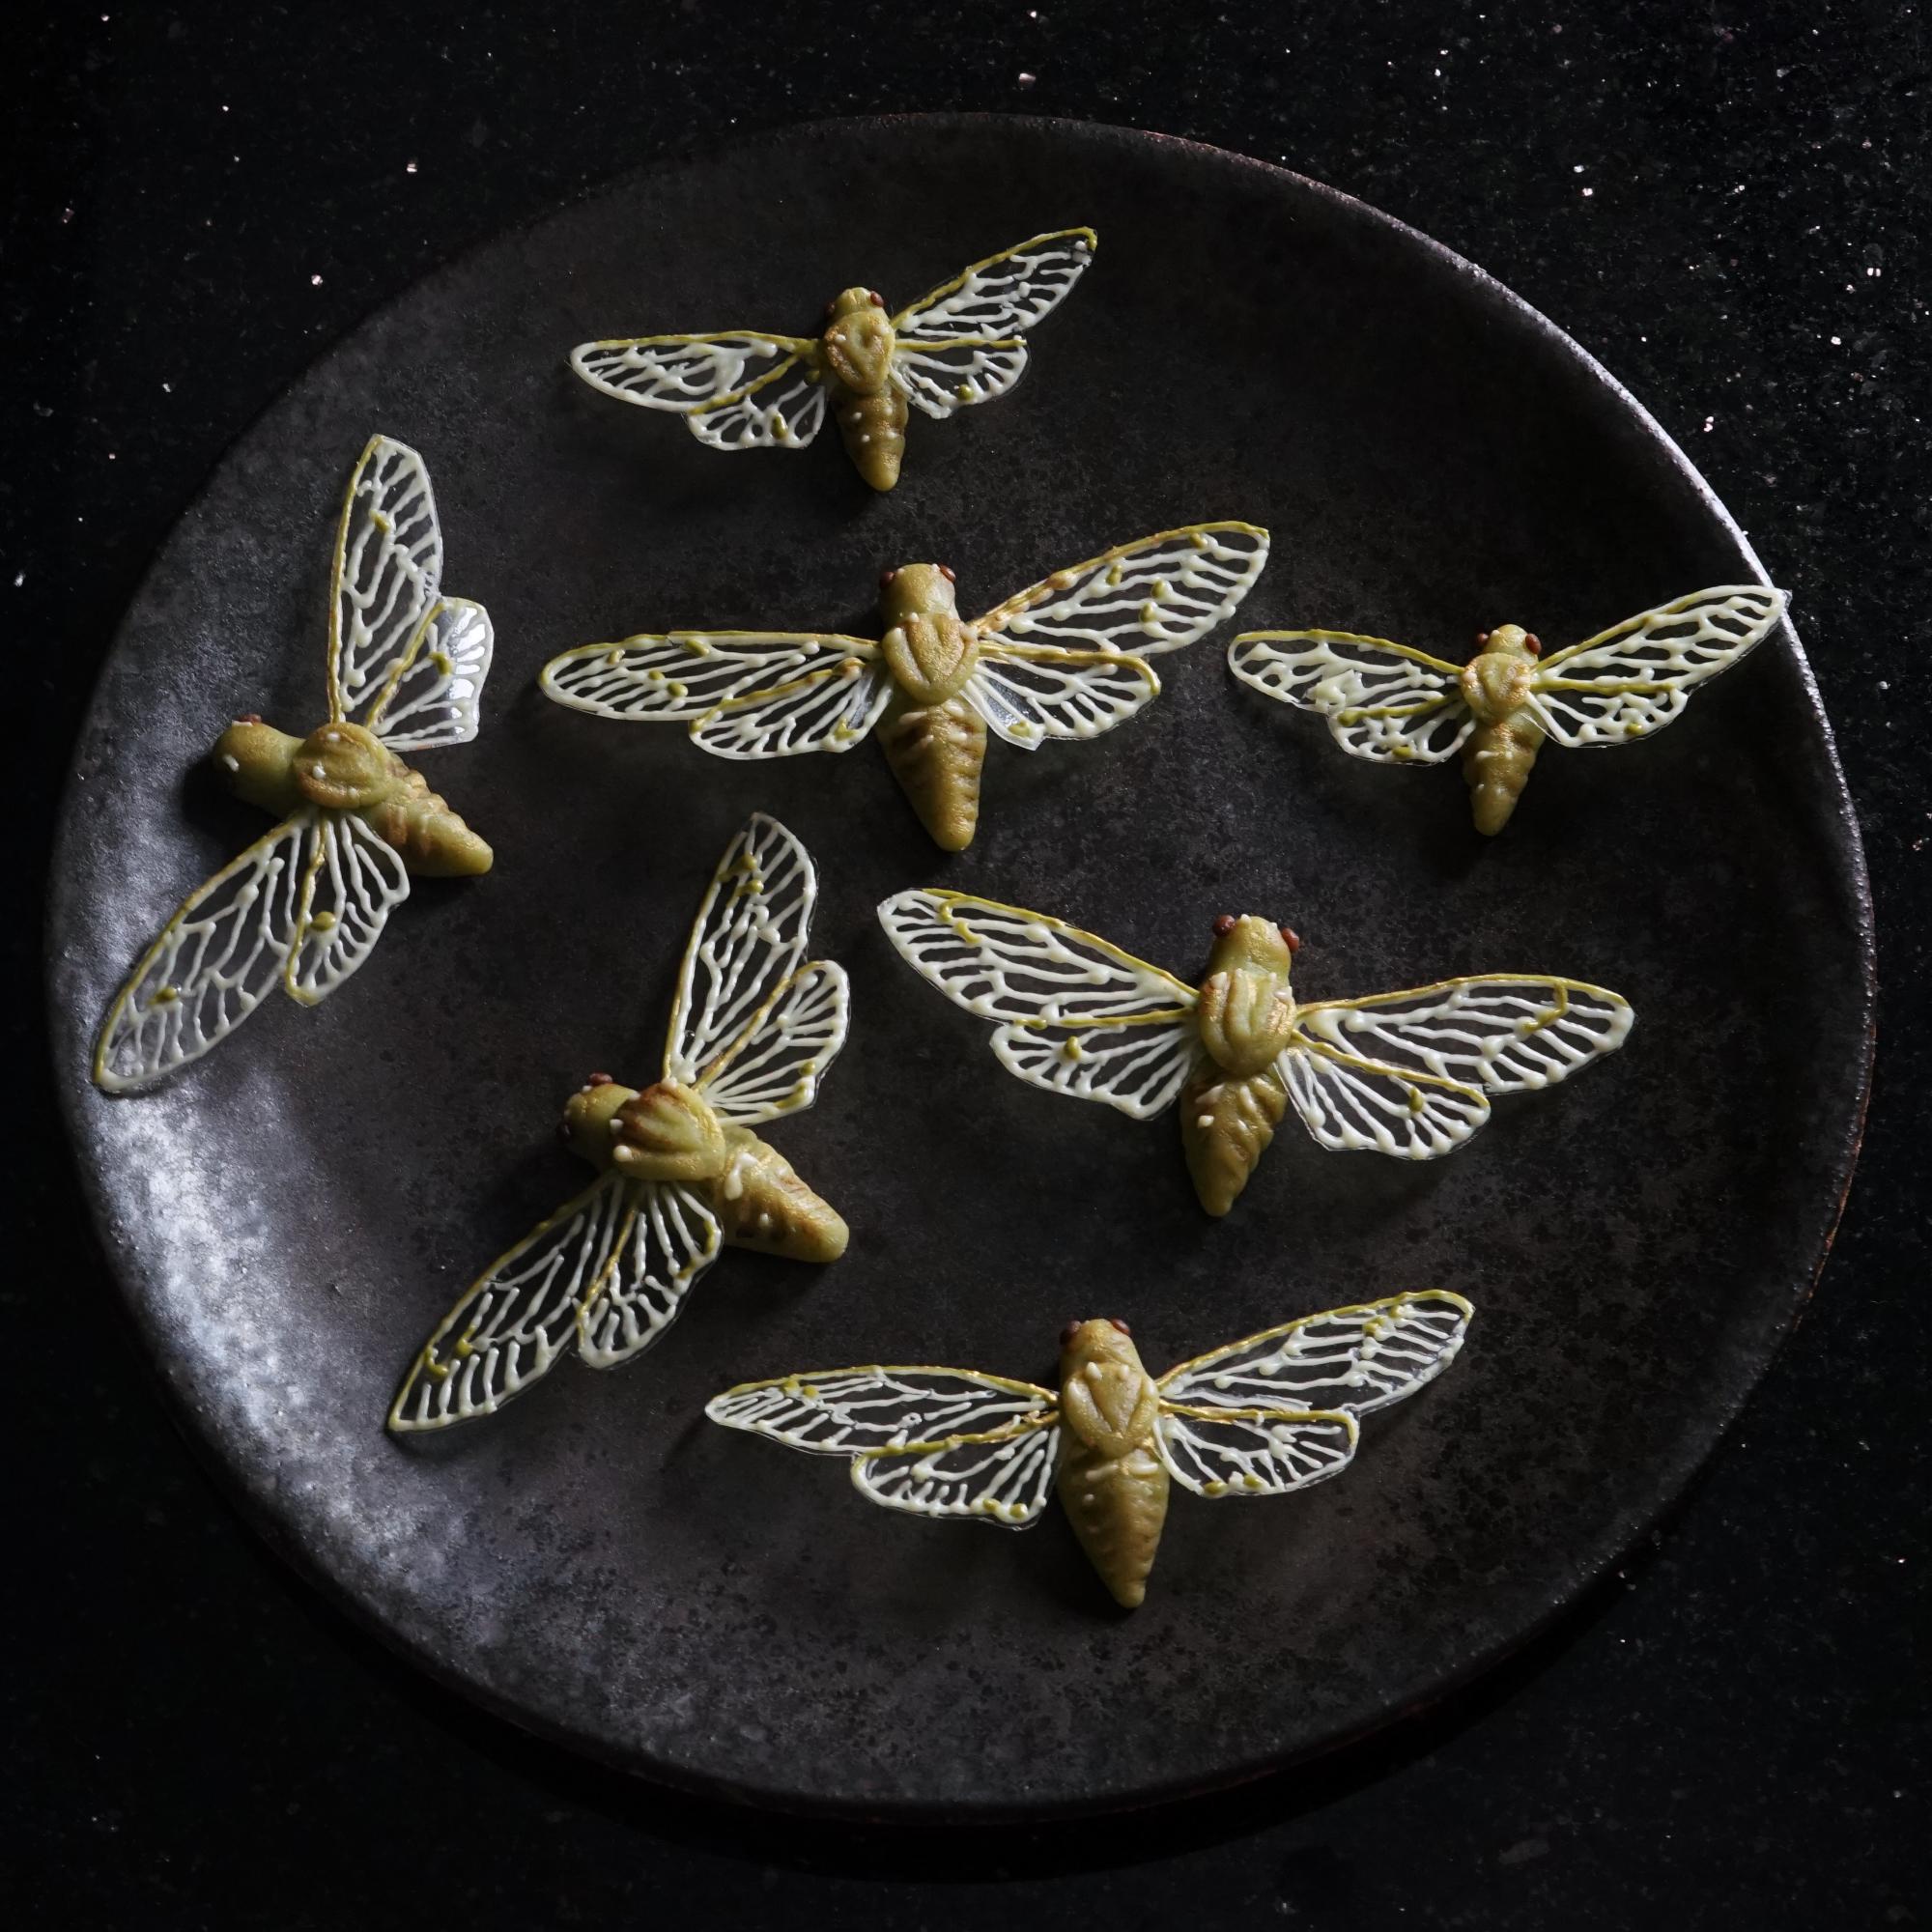 cicadassmall.jpg